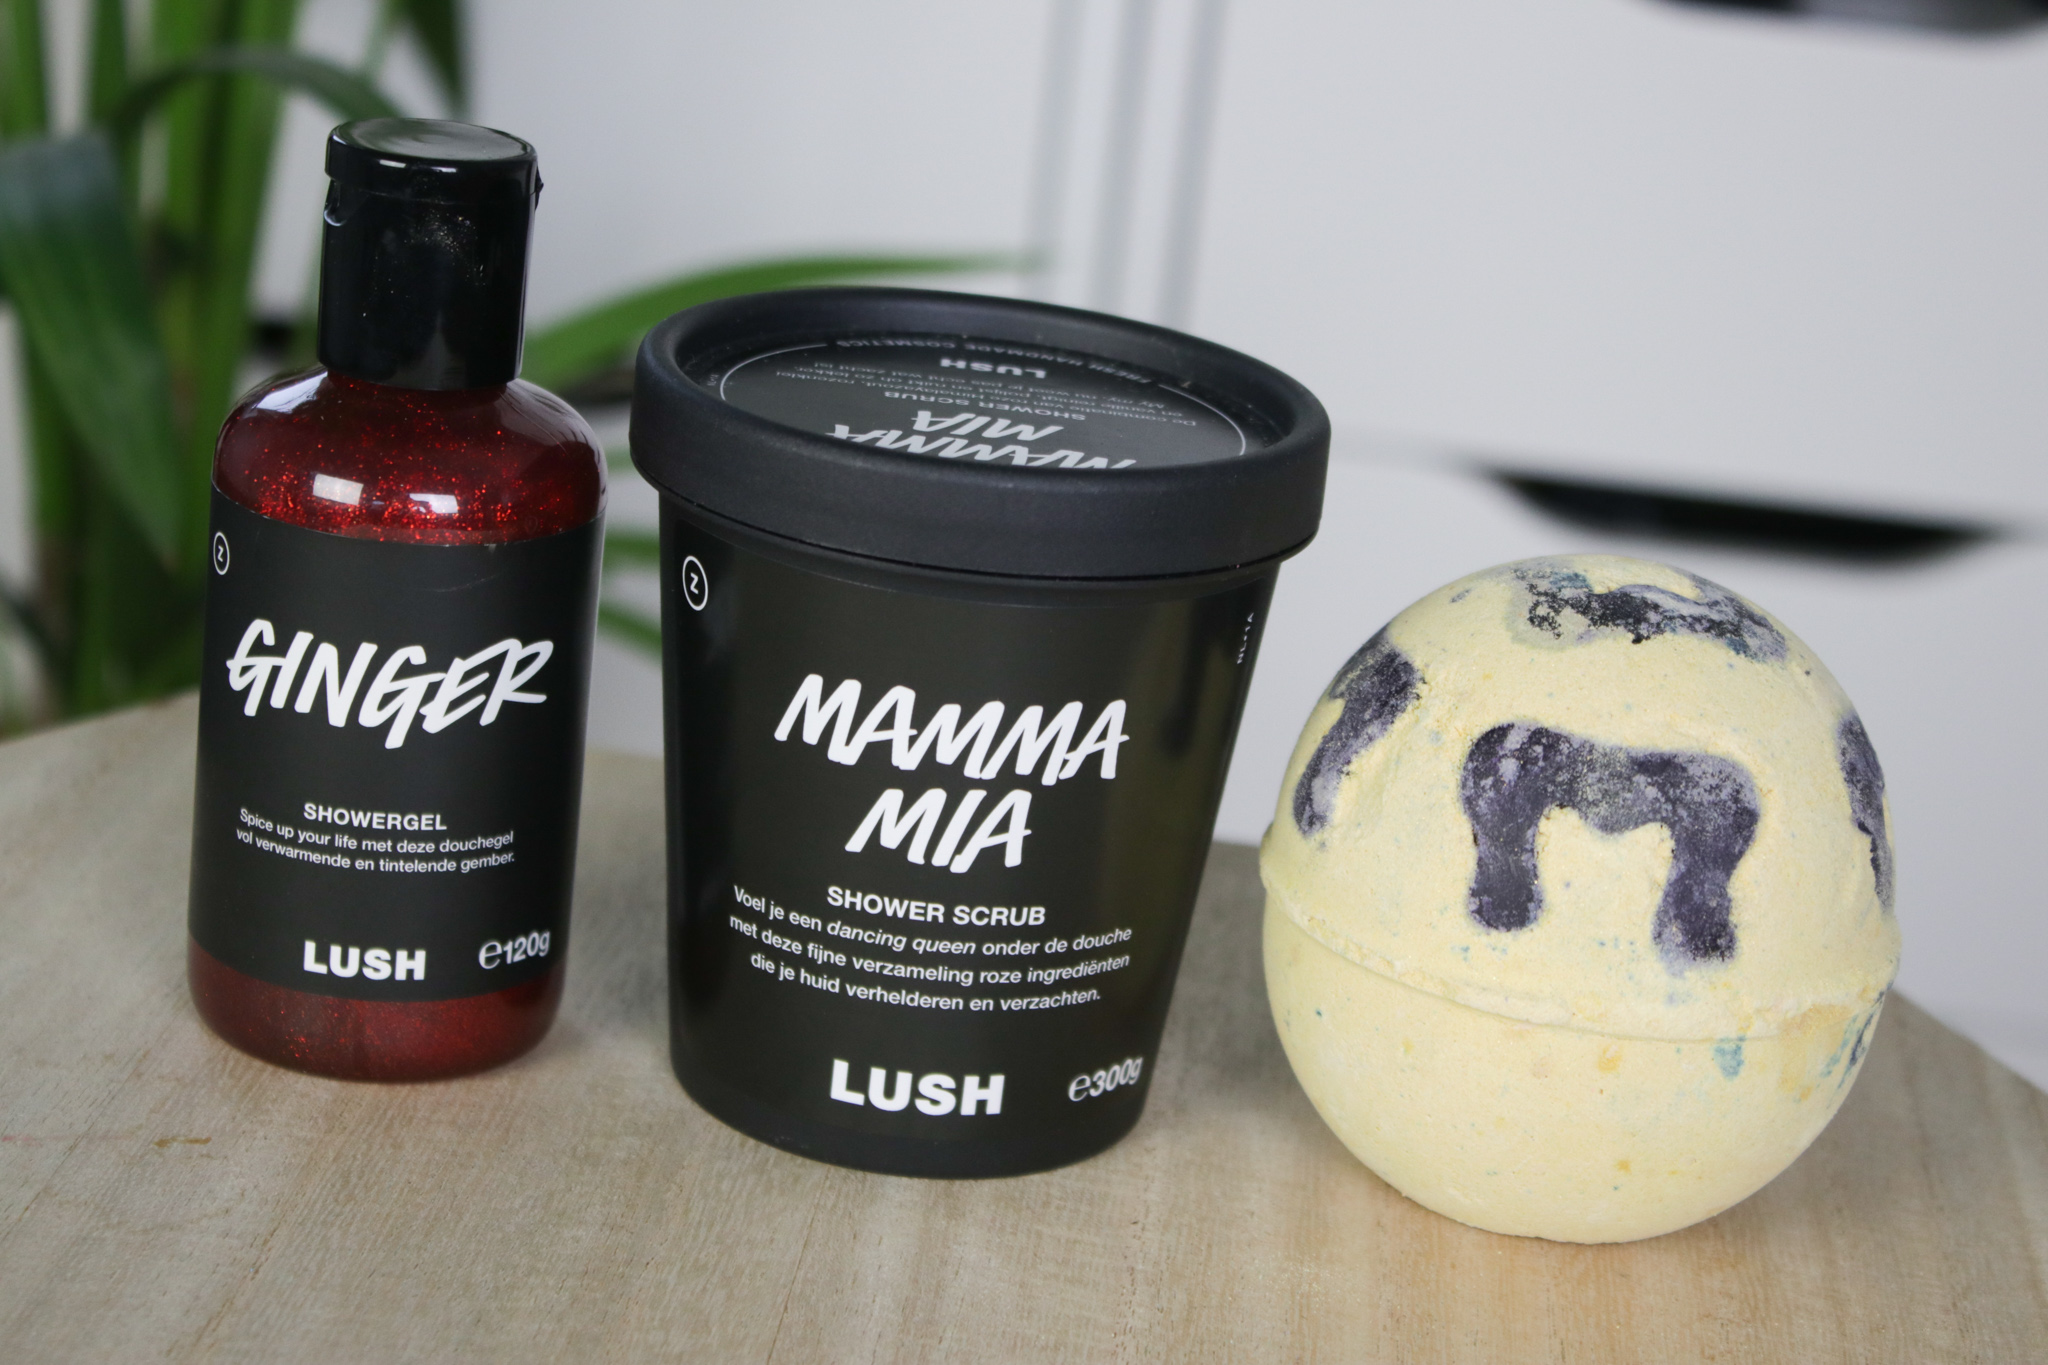 LUSH Moederdag 2020: Ginger showergel, Mamma Mia shower scrub & Blazin' Bad Zula bath bomb